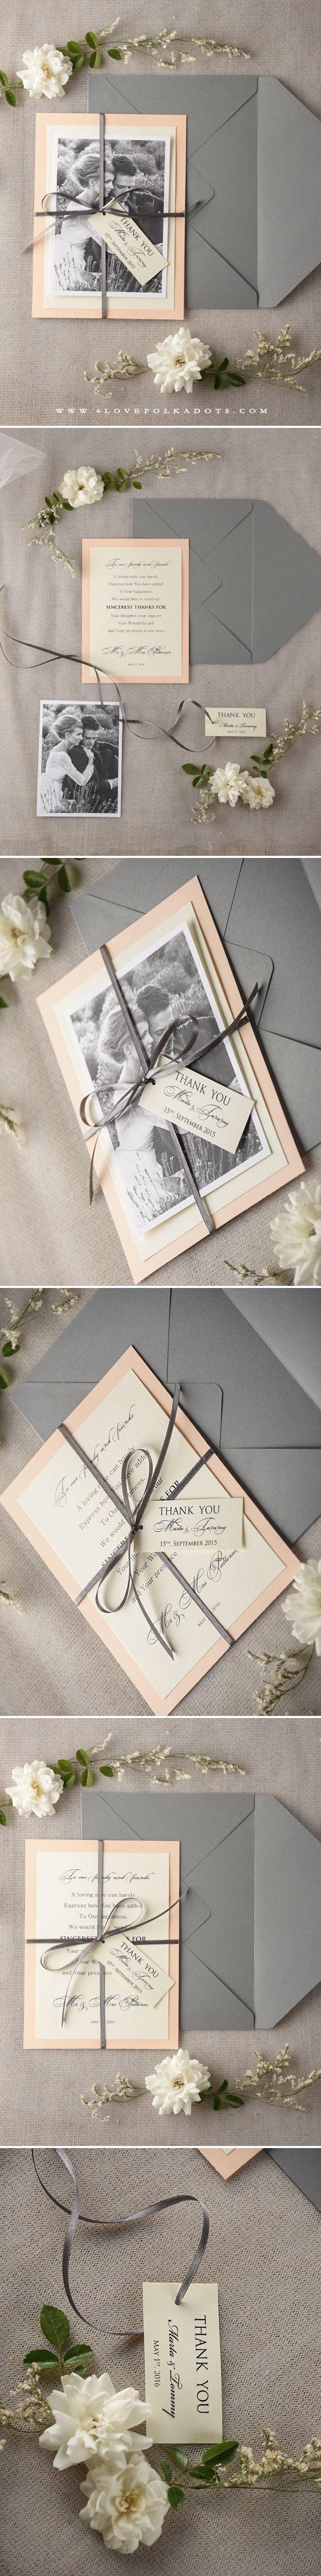 Wedding Thank You Card with Photo #weddingideas #thankyou #summerwedding